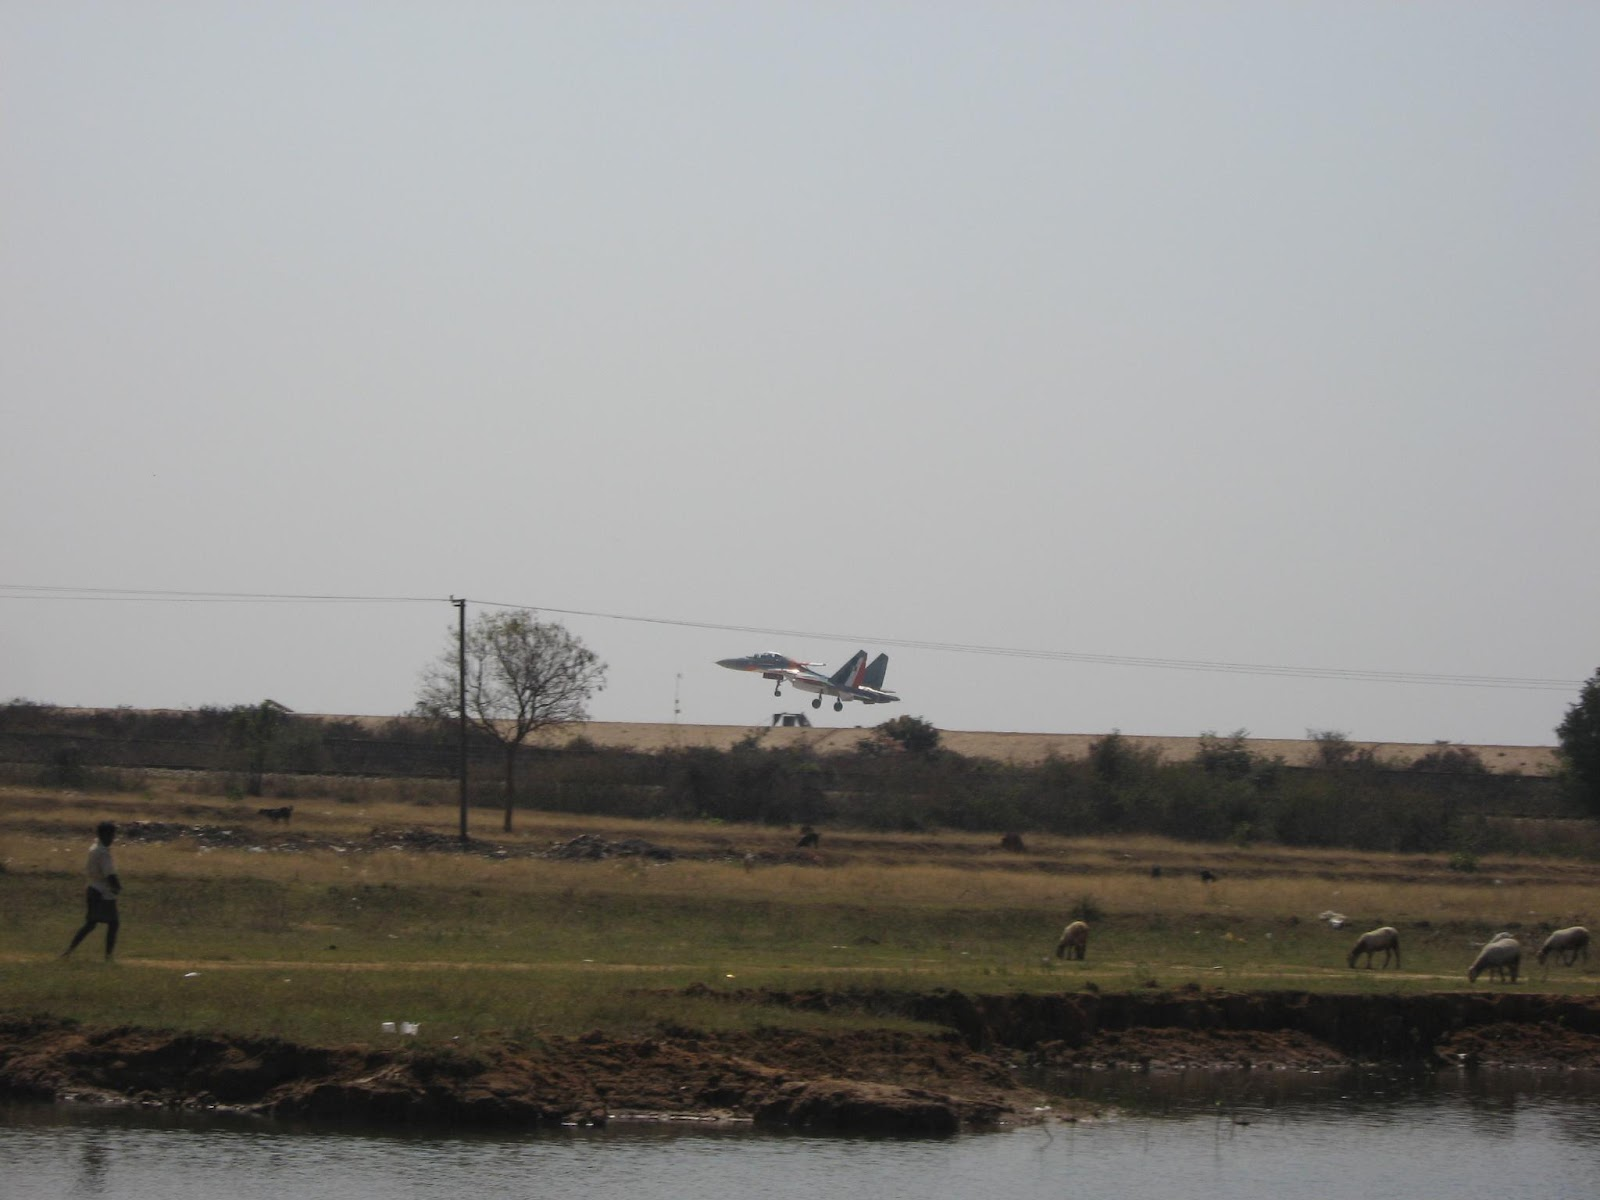 Images from Aero India at Bengaluru